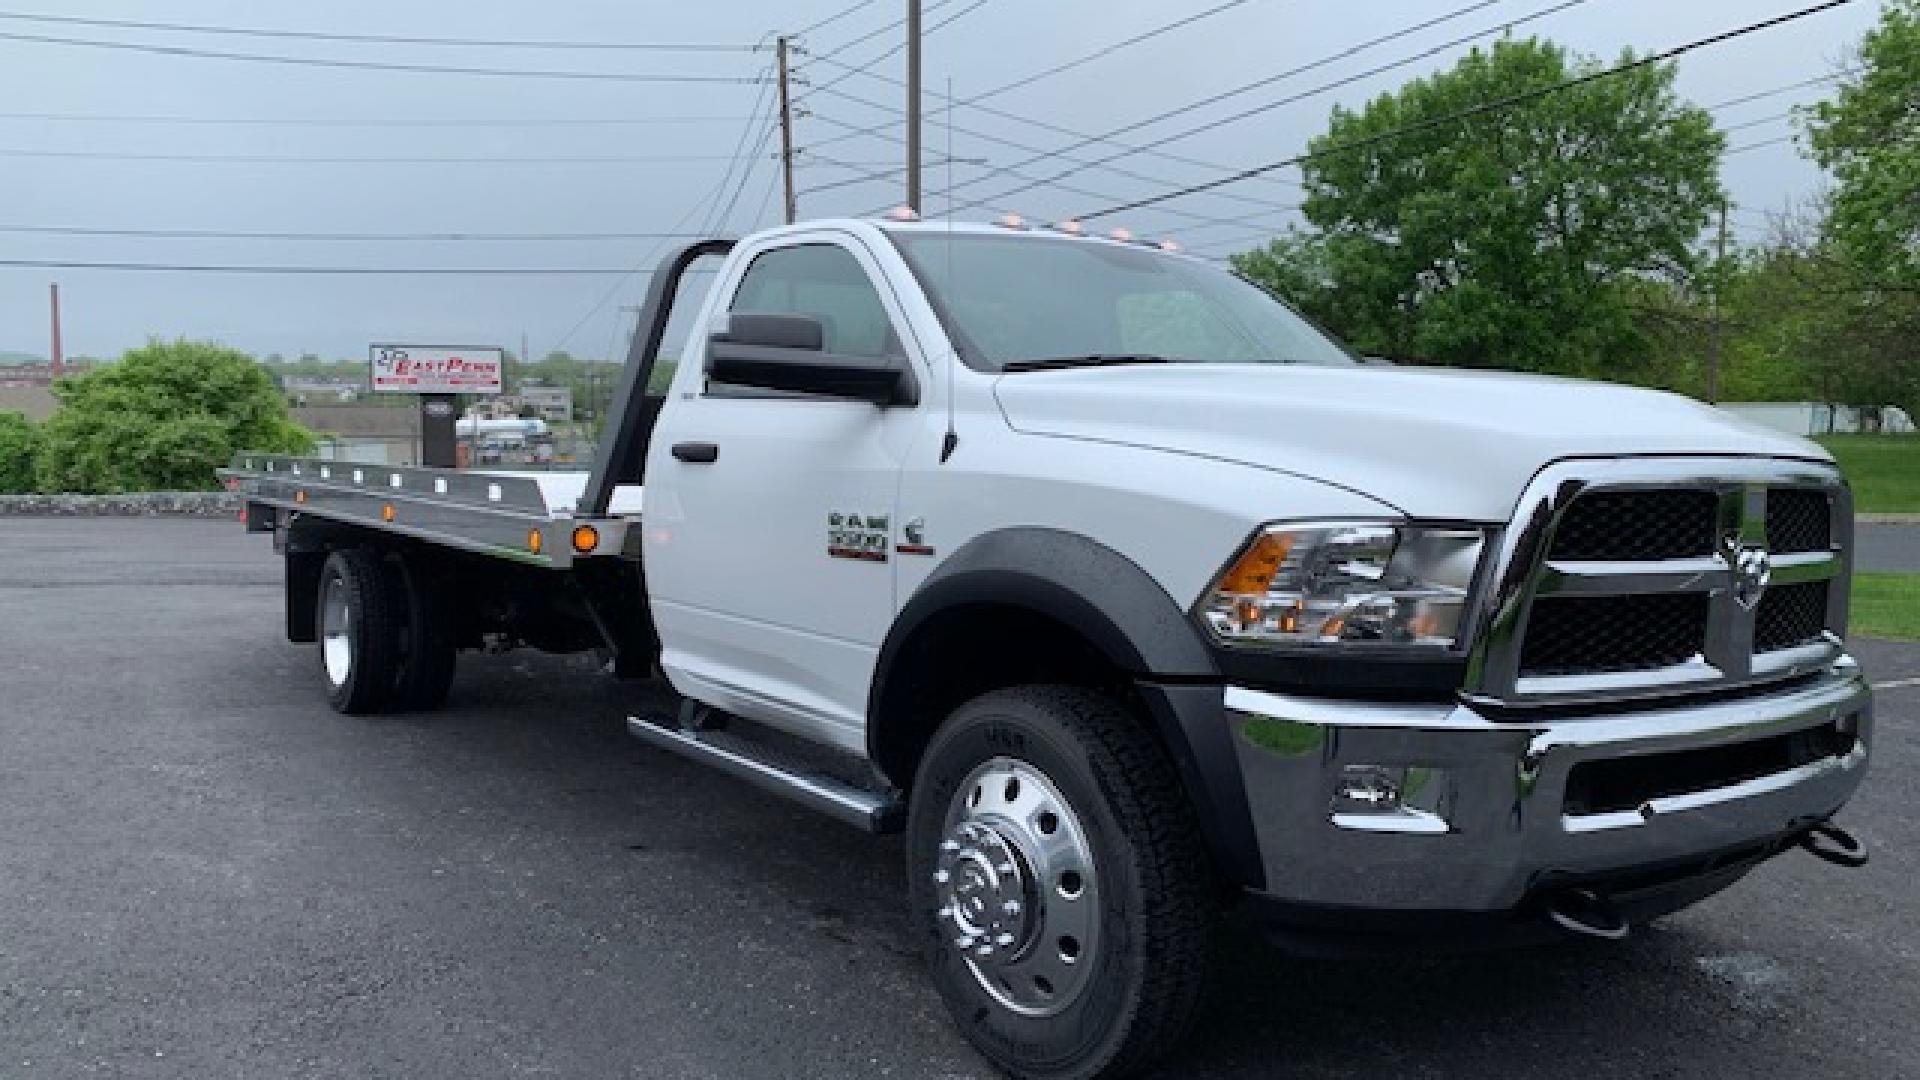 east penn truck equipment, new inventory, 2018 ram trucks, chevron series 10 gen II